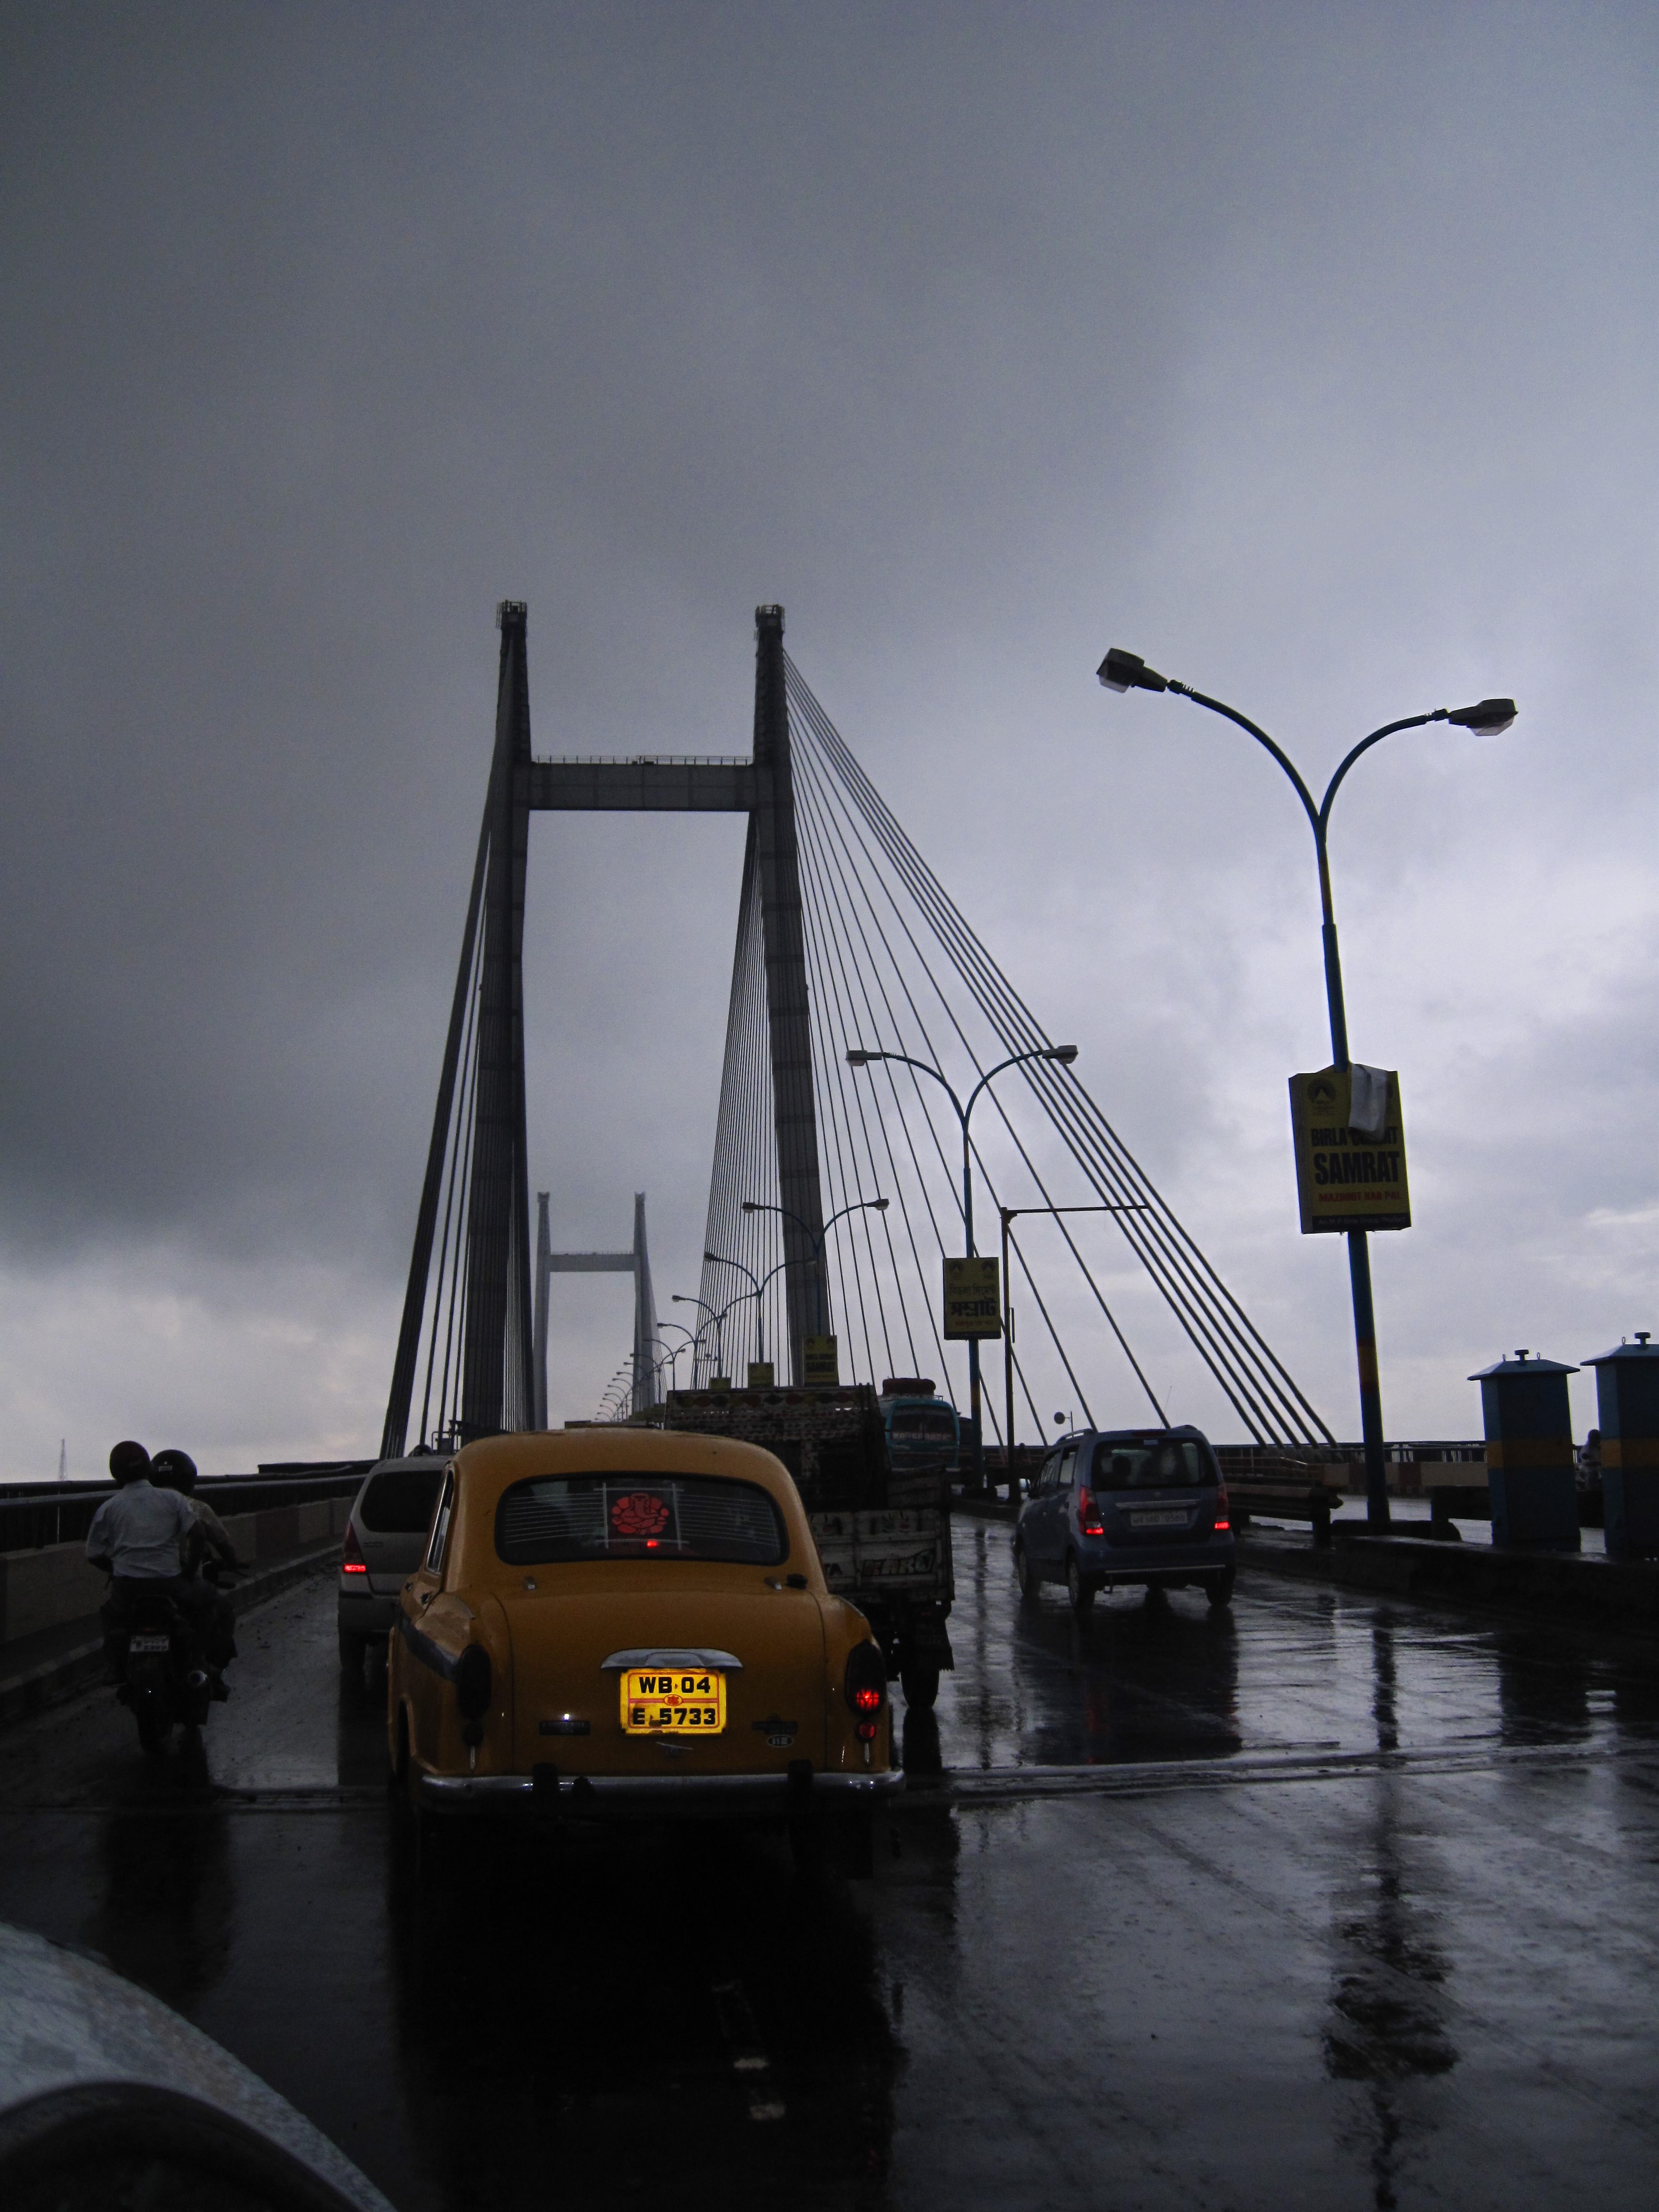 Hoogly bridge